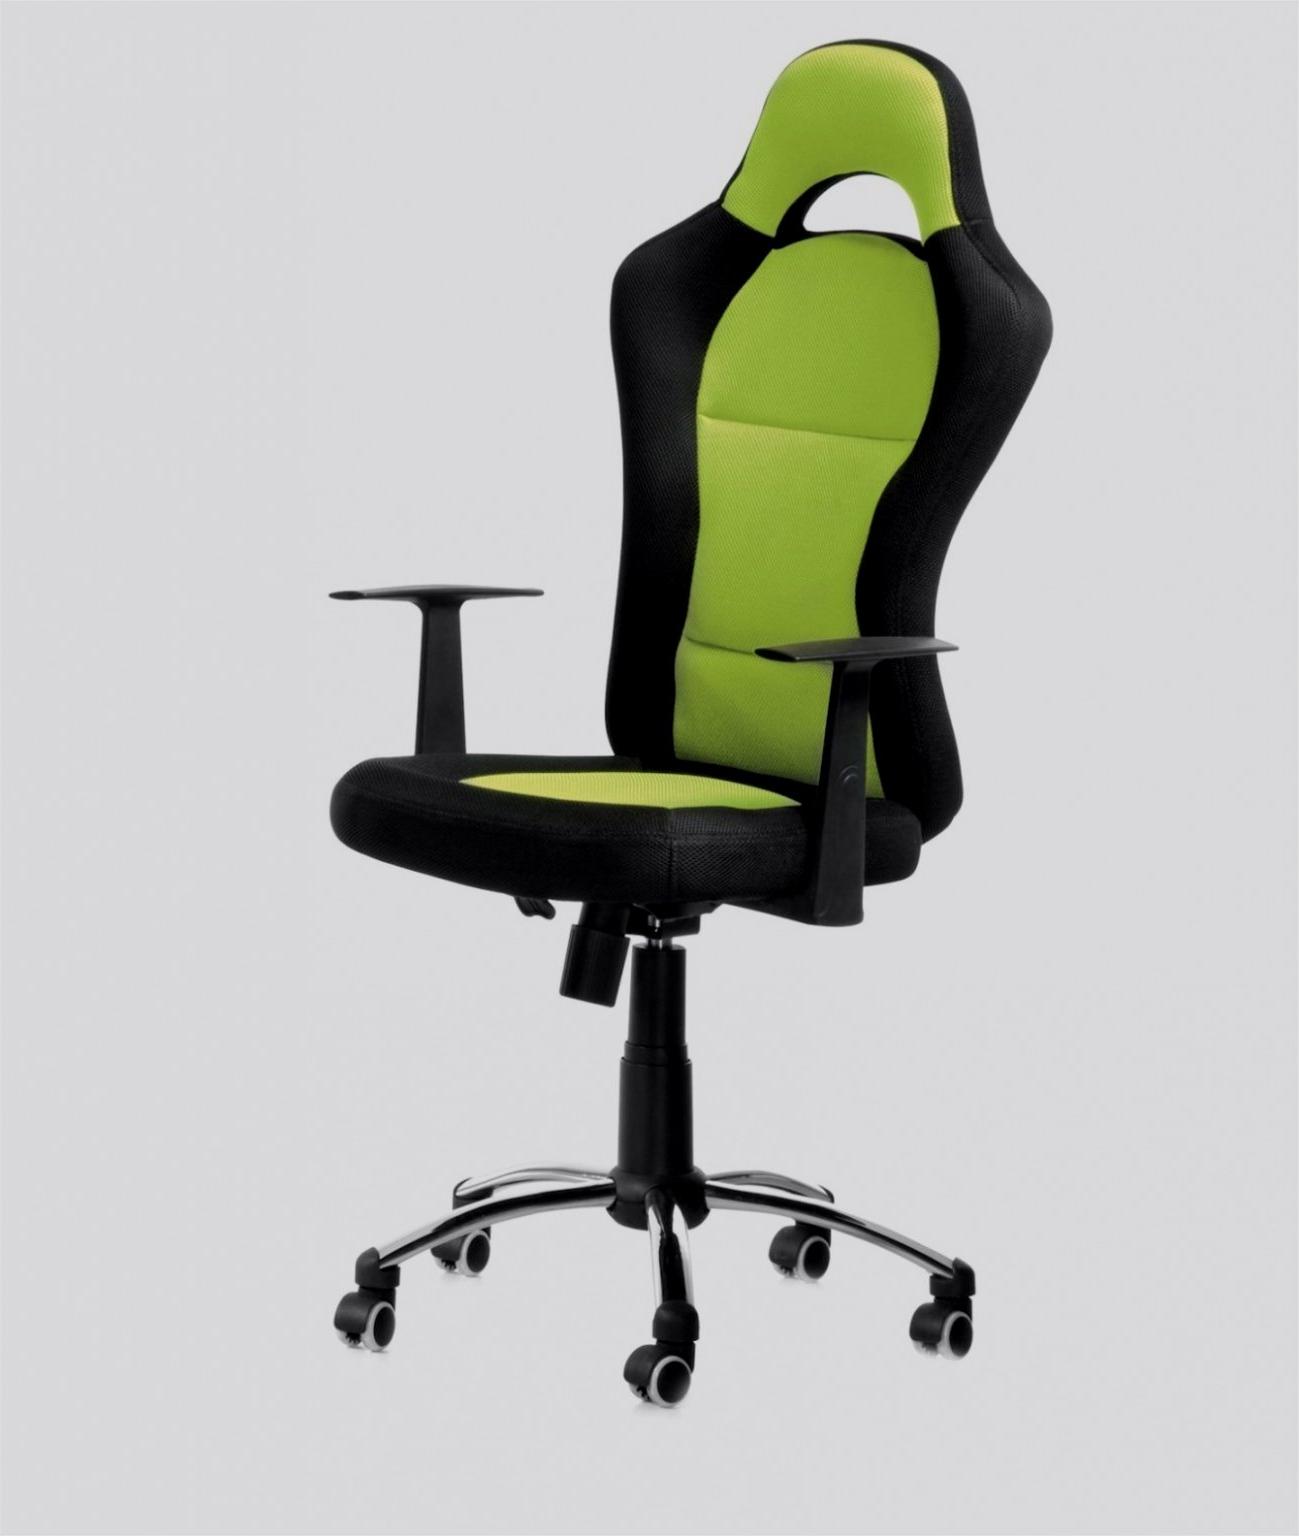 Sillas de oficina carrefour trendy sillas oficina for Ofertas de sillas de oficina en carrefour